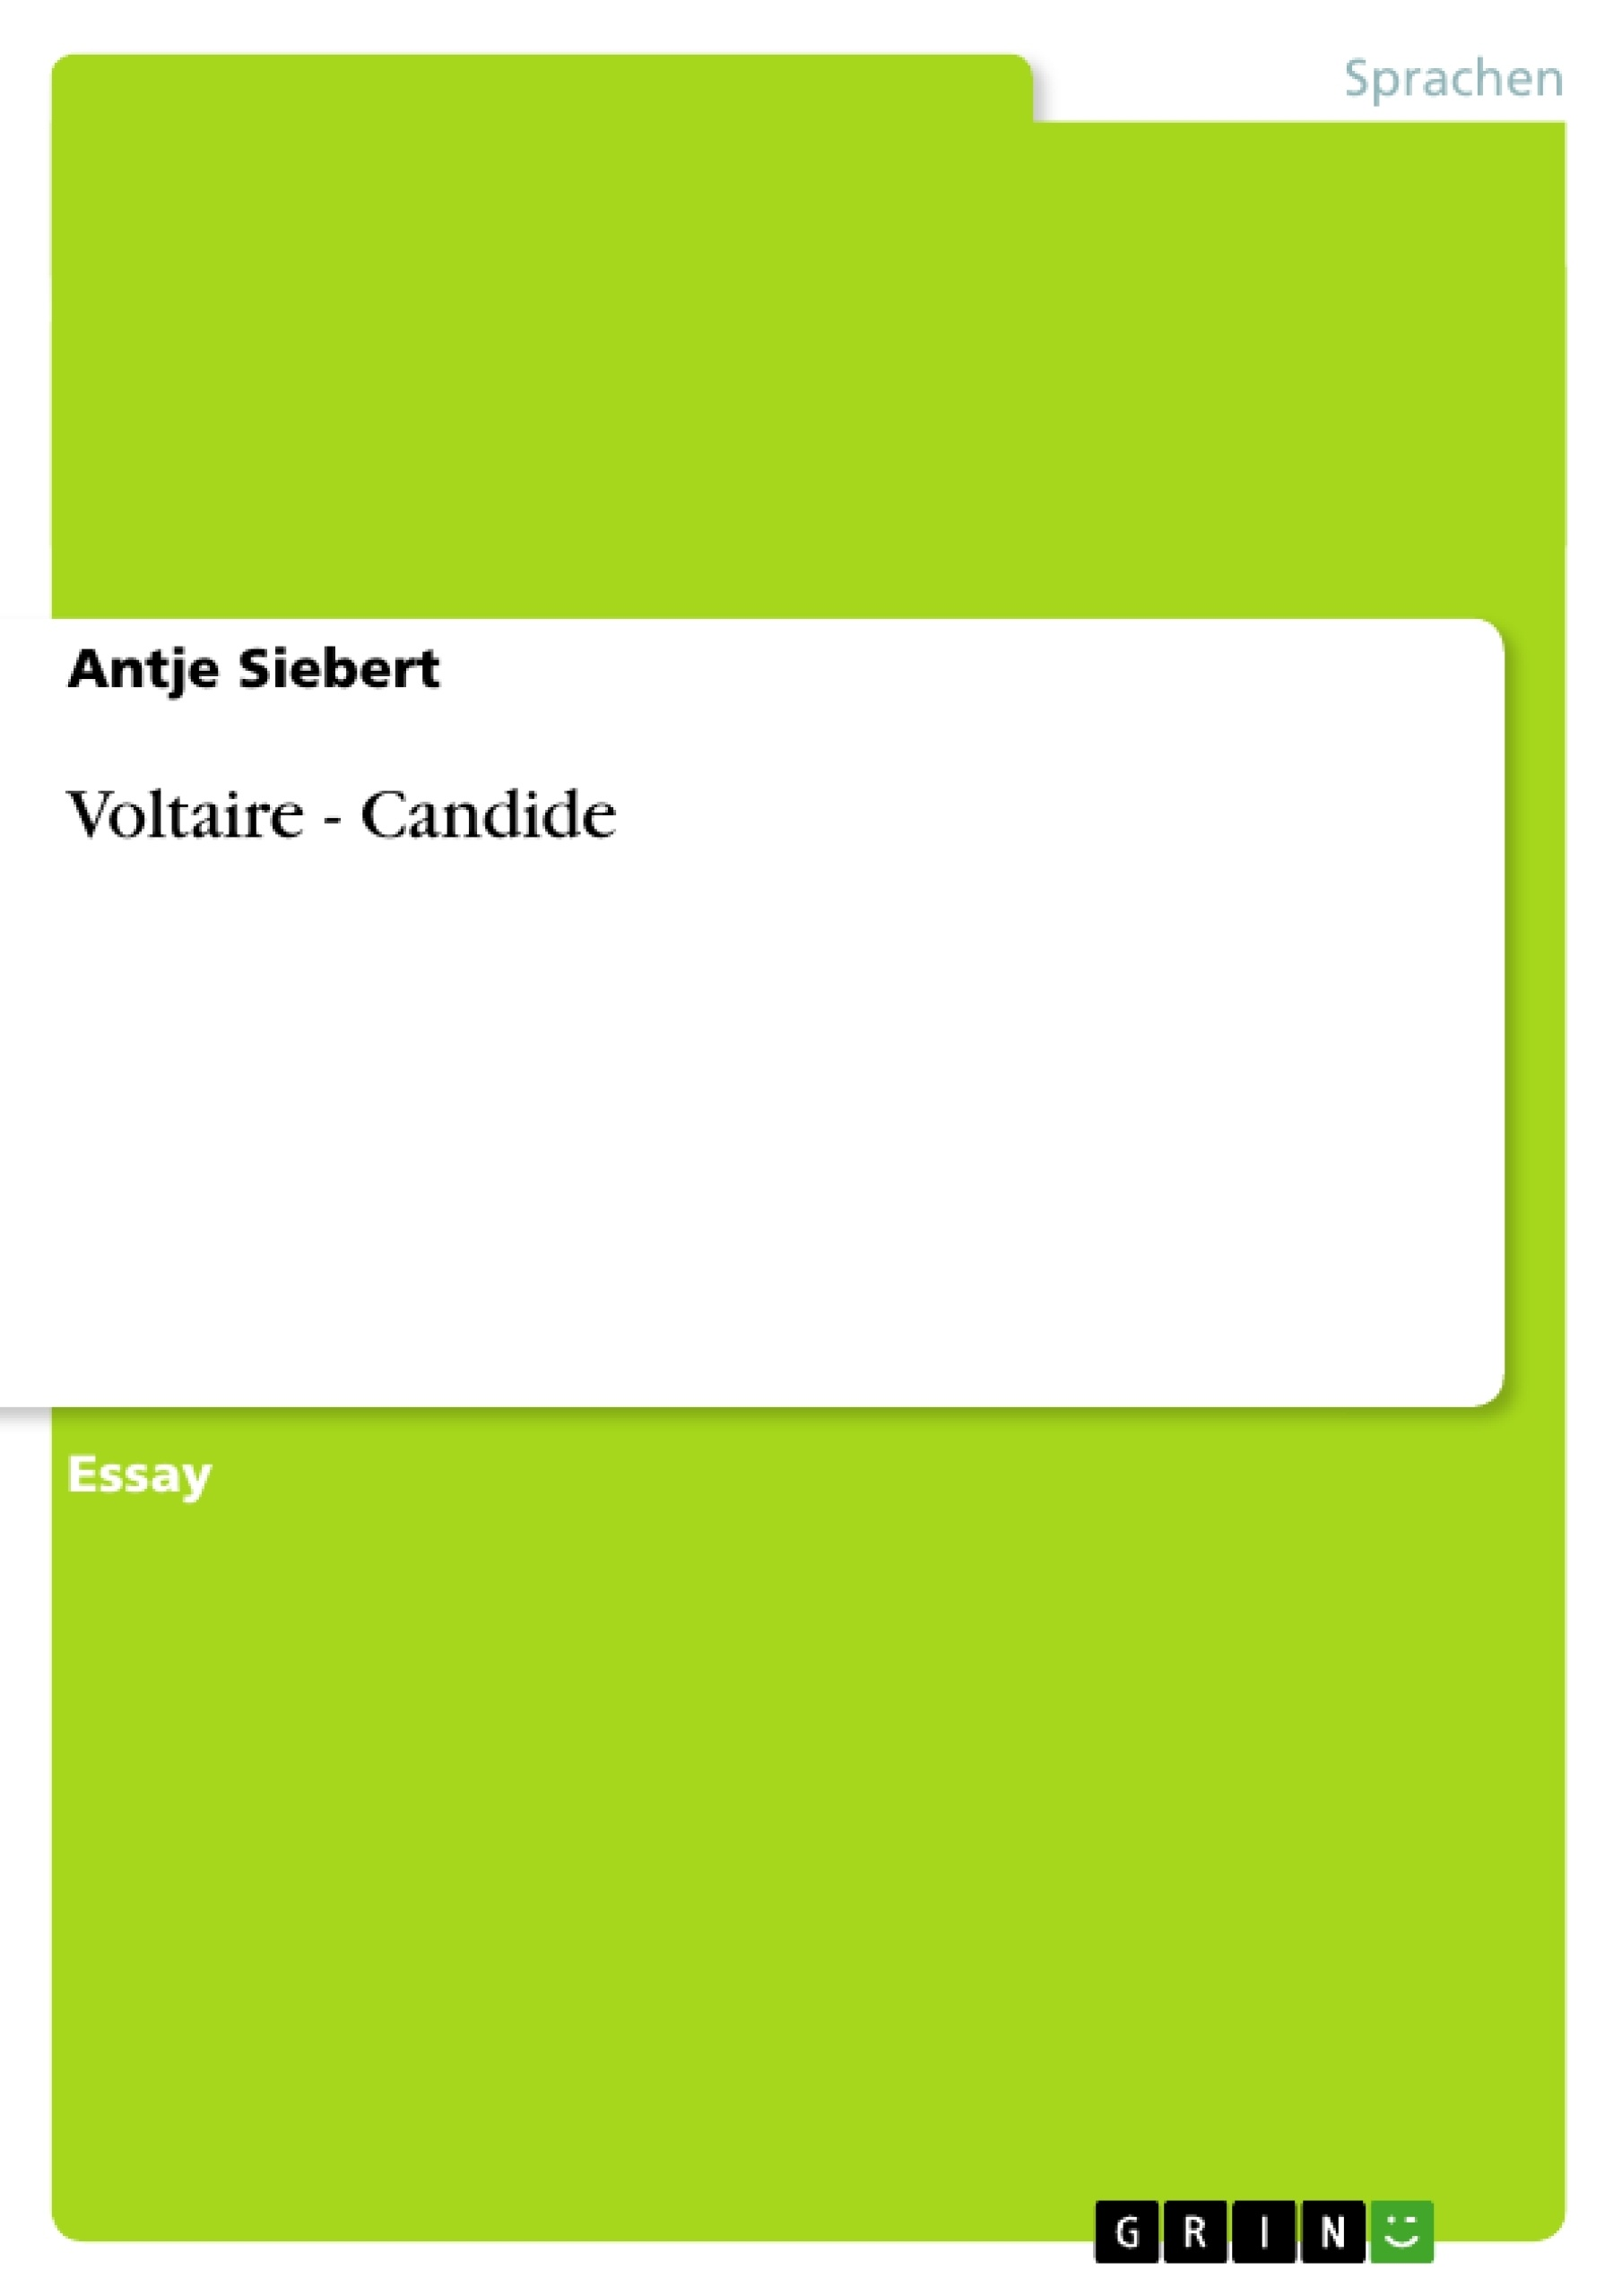 Titel: Voltaire - Candide